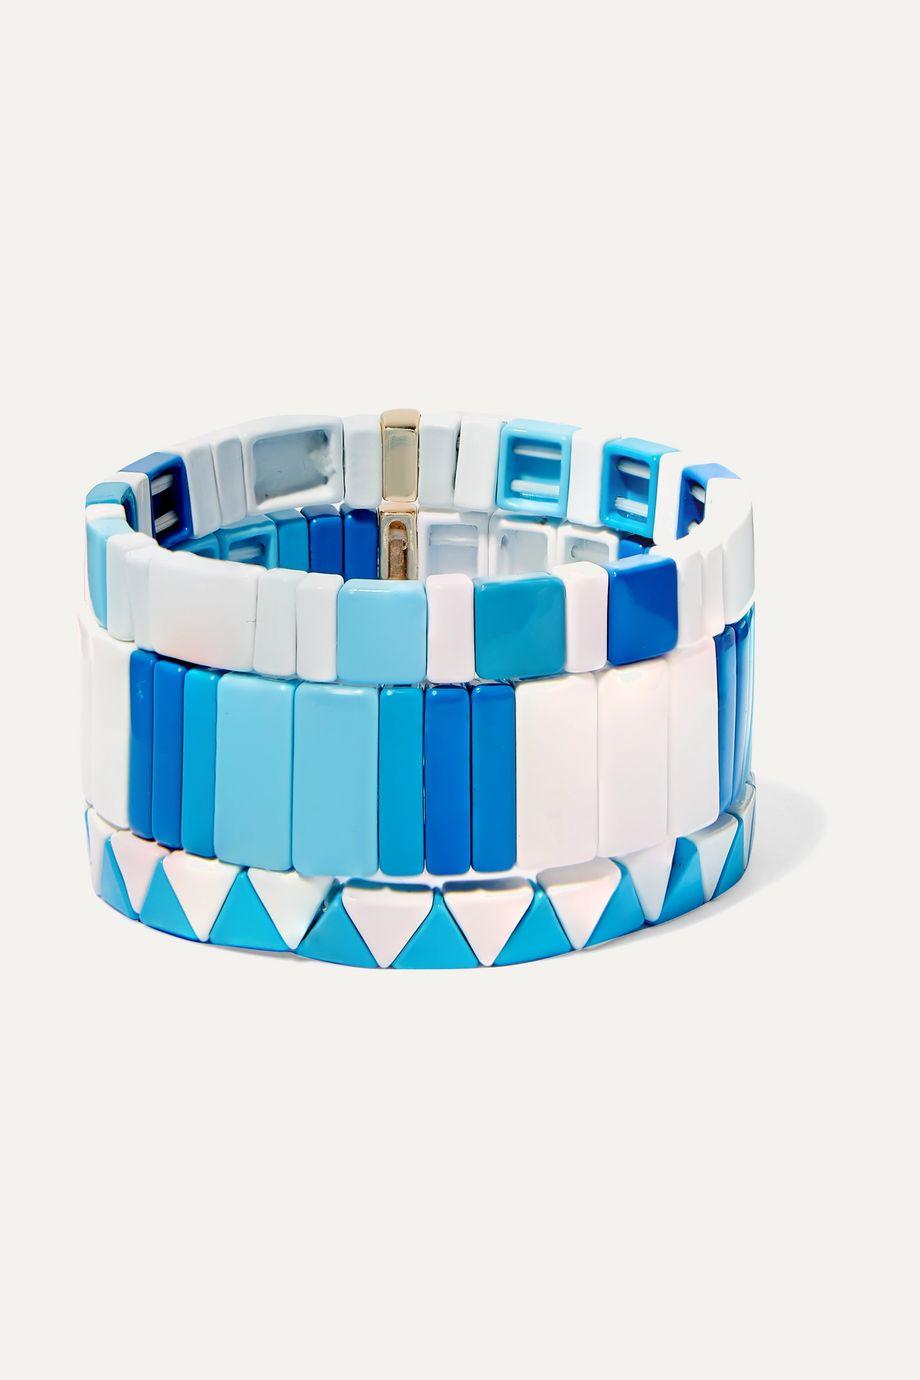 Roxanne Assoulin Mykonos 搪瓷手链(三只装)